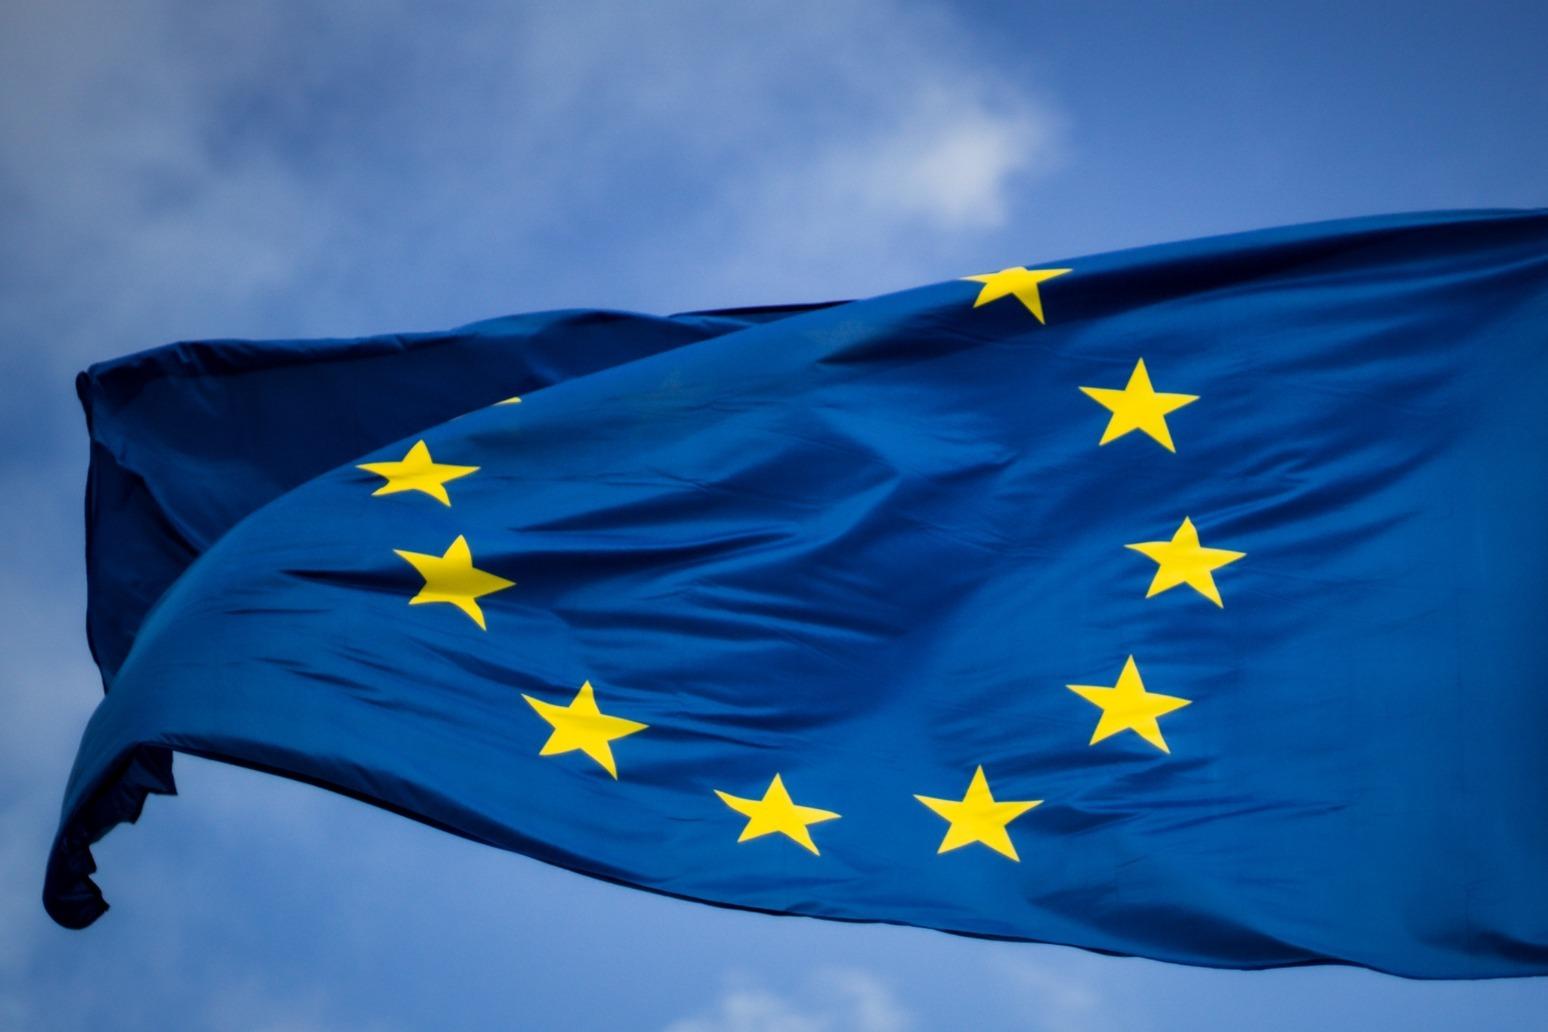 Boris Johnson hails fifth anniversary of Brexit referendum